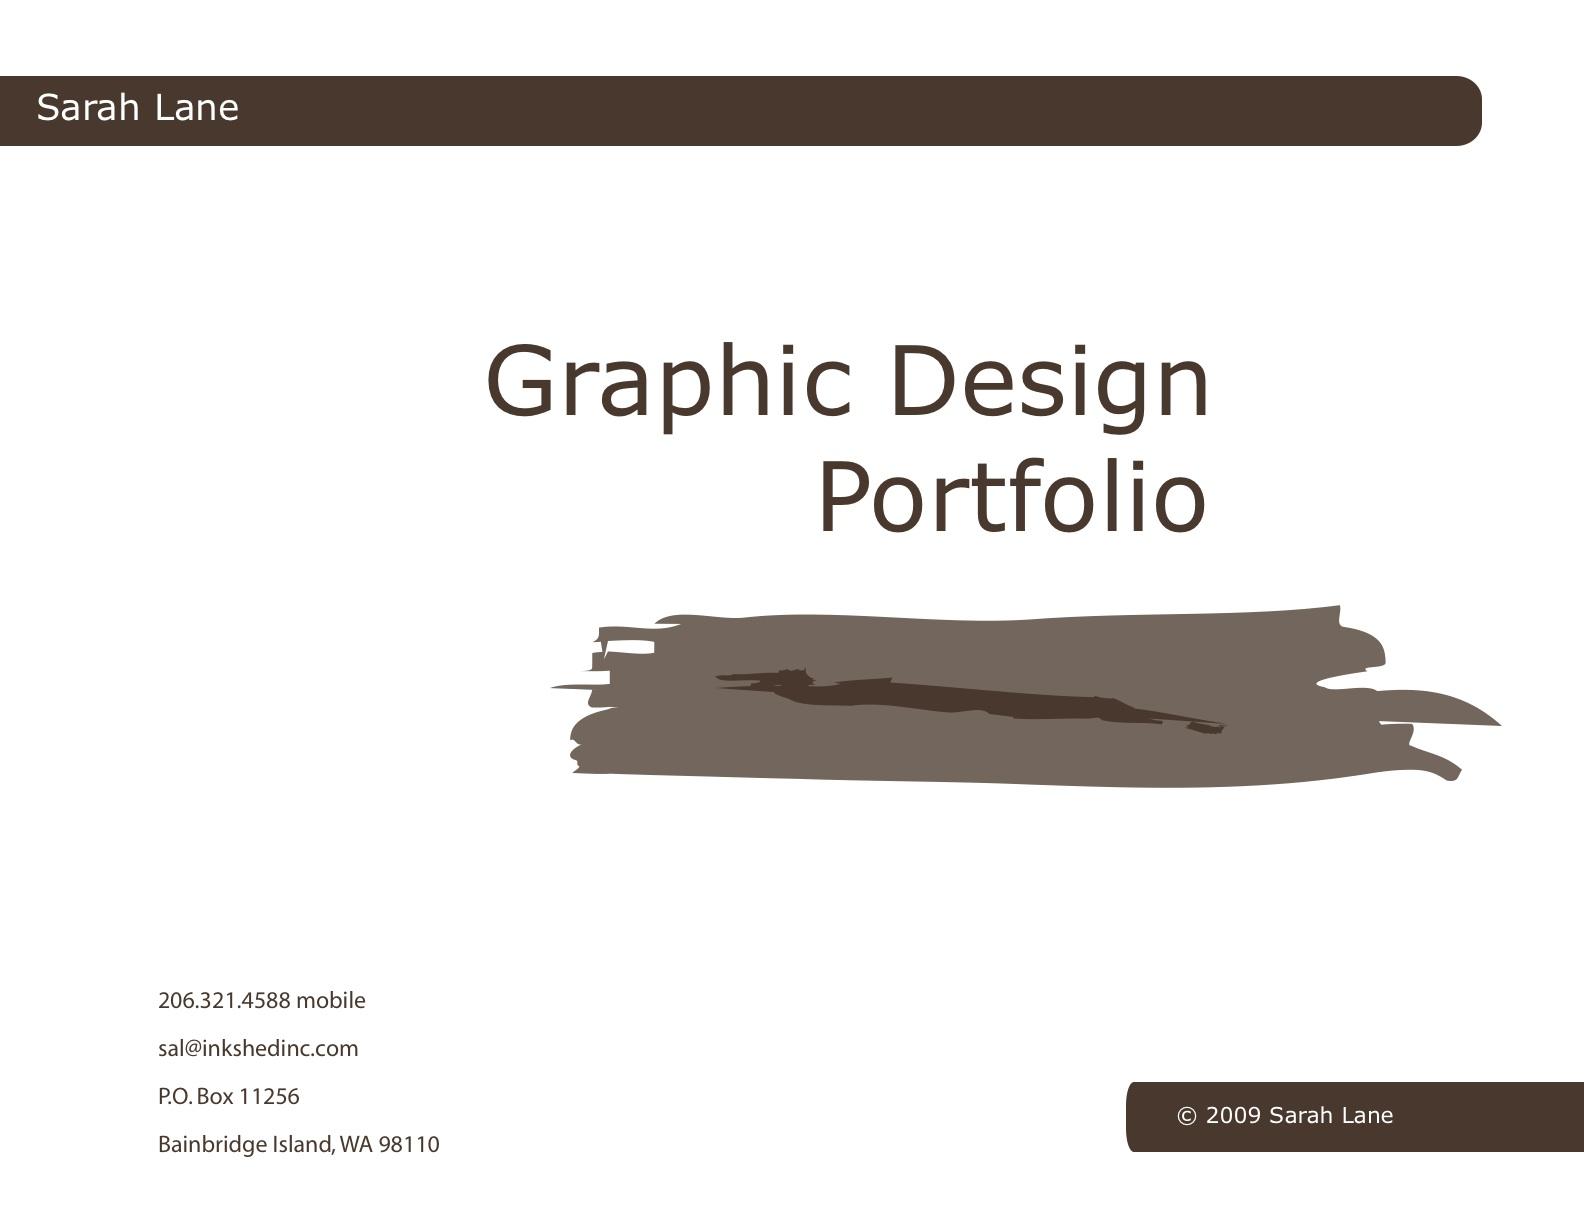 graphic design portfolio pdf - Hizir kaptanband co